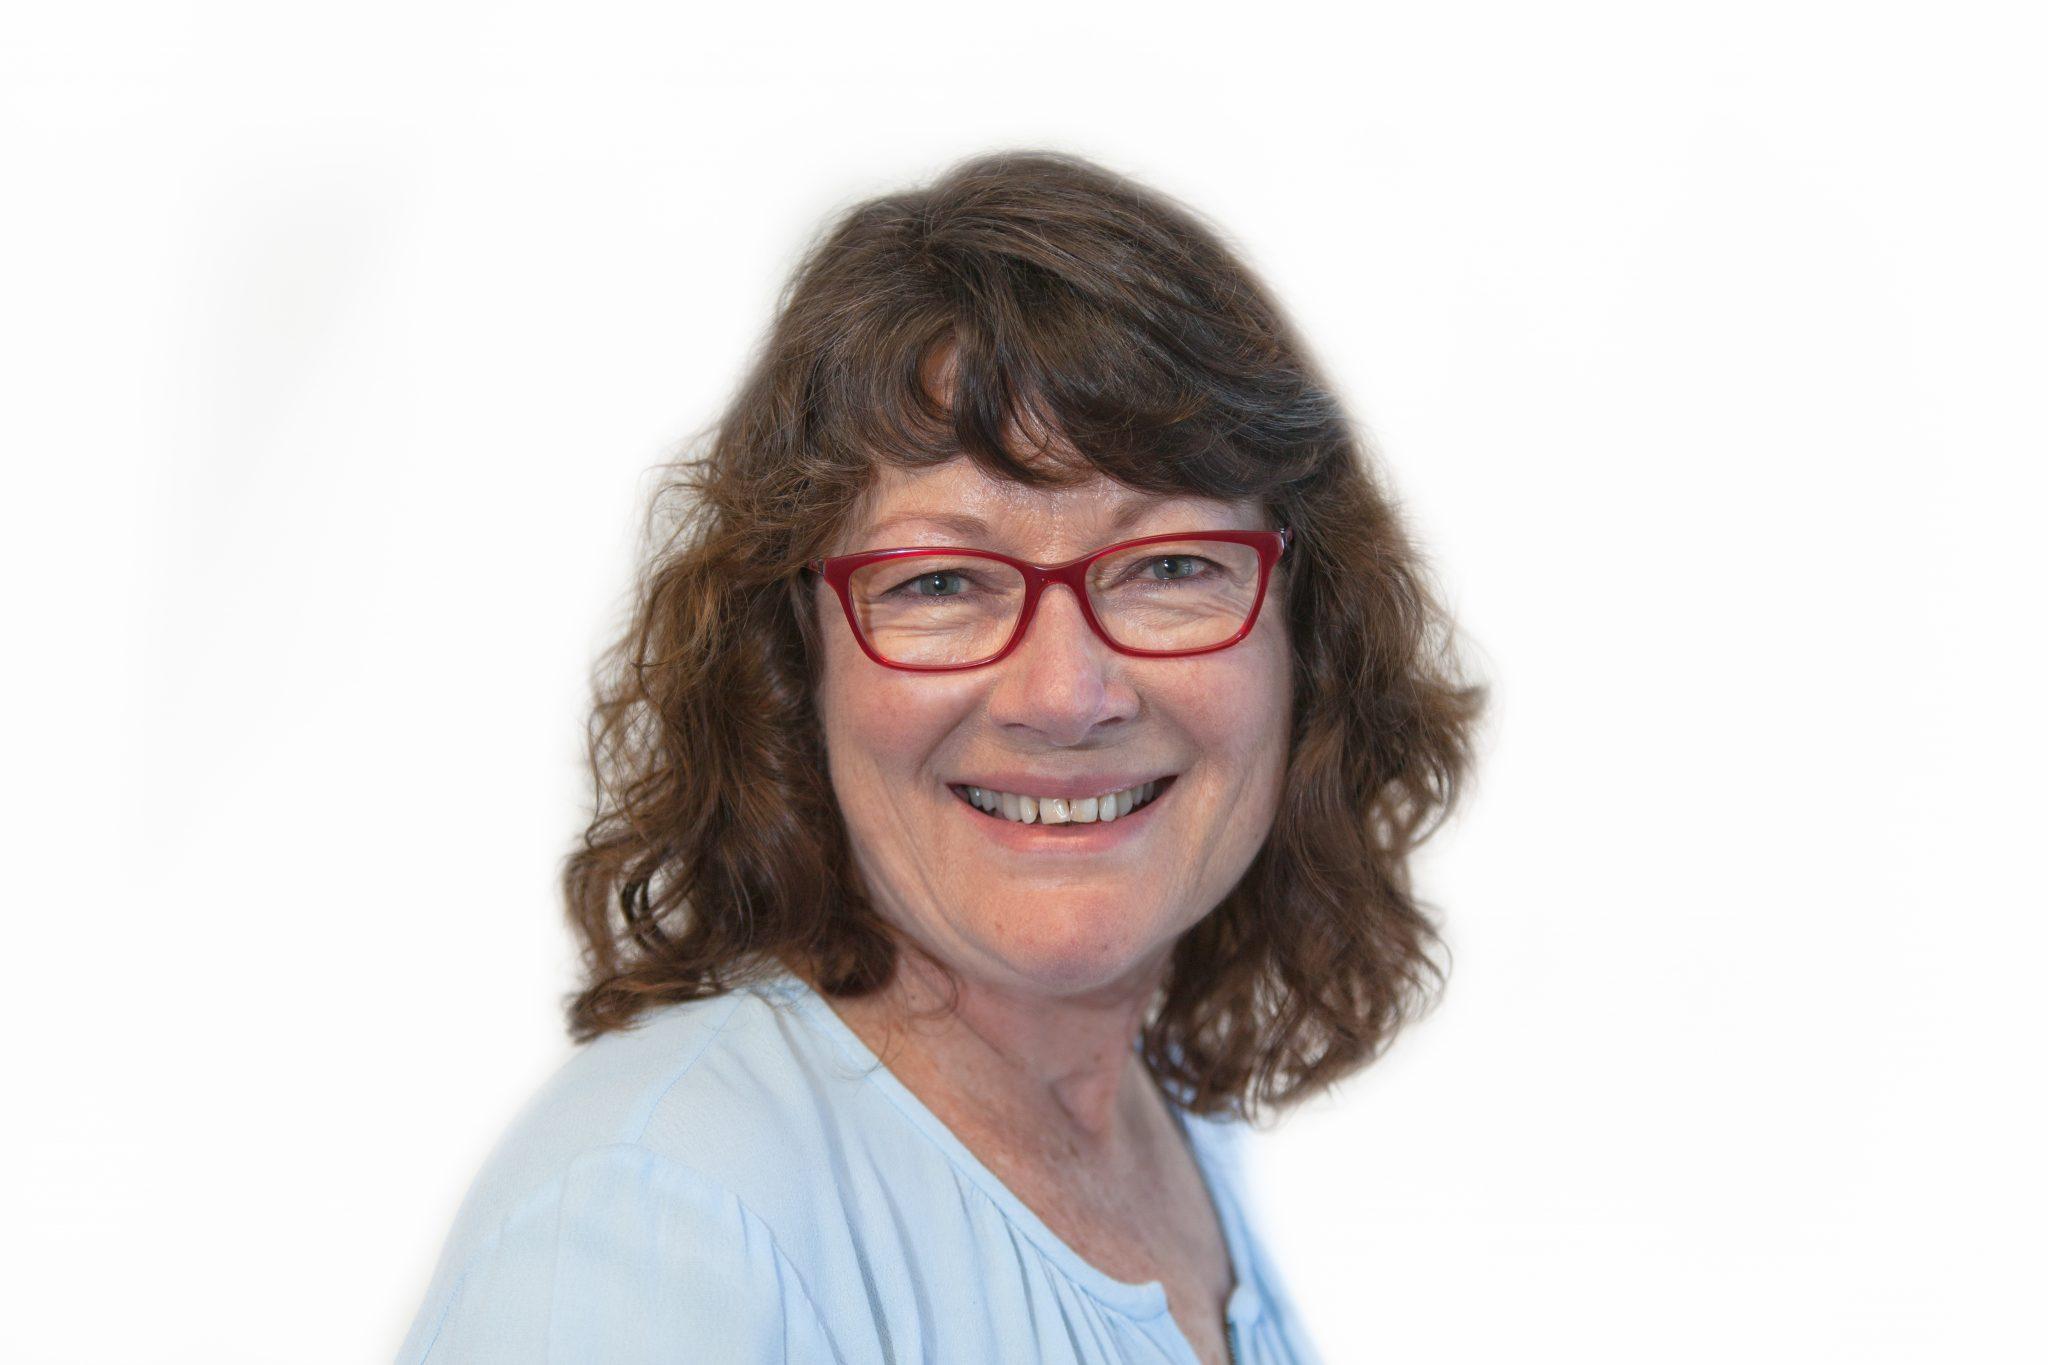 Lynn Ogle